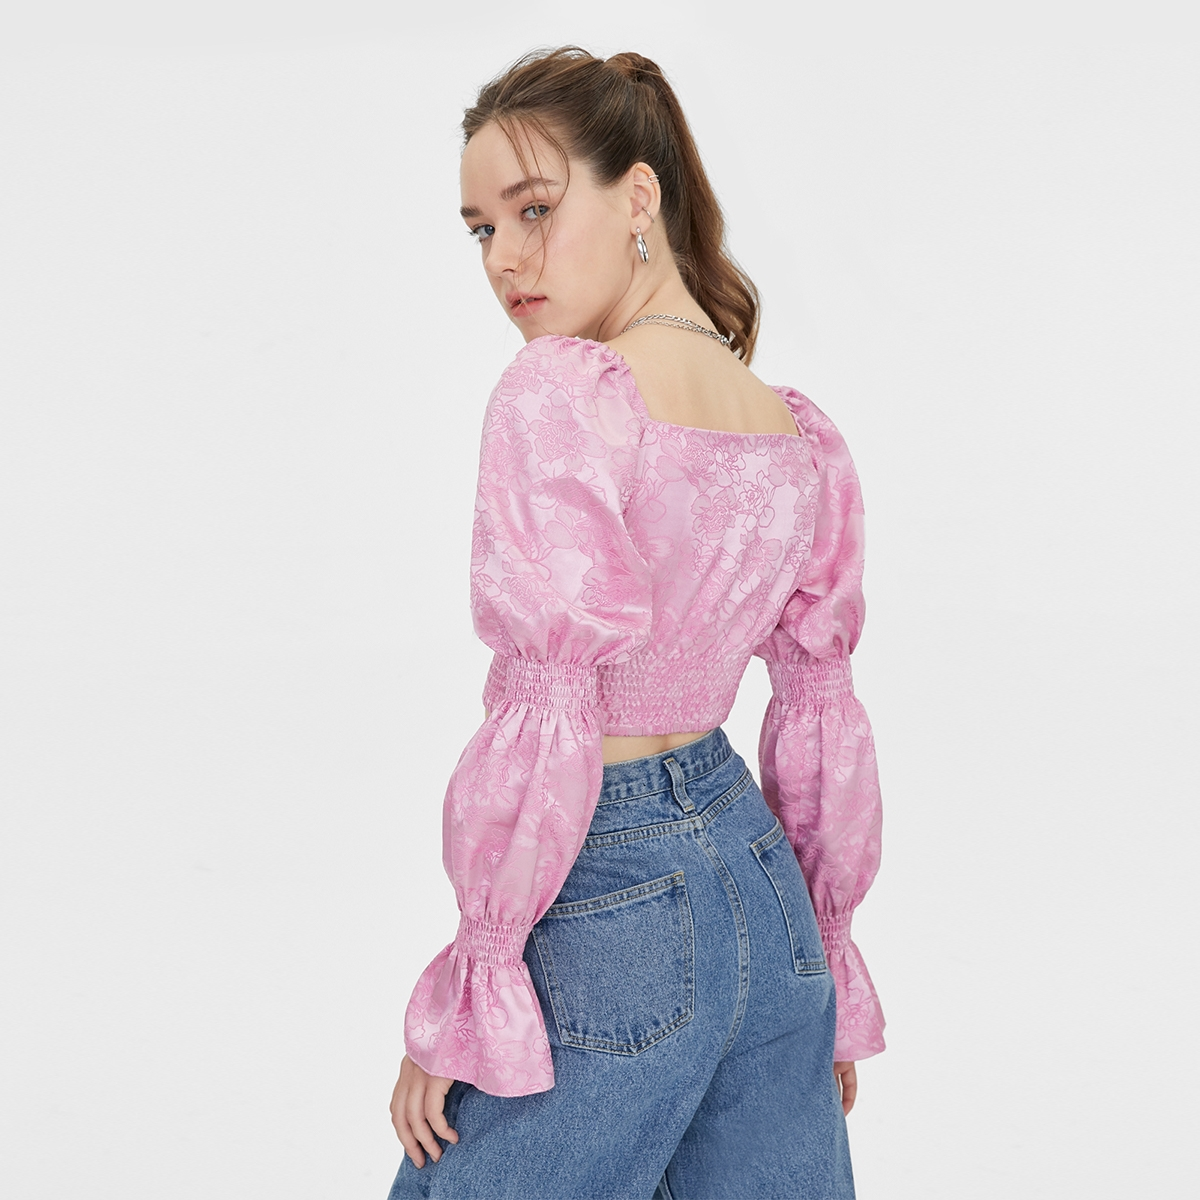 Matter Makers Satin Jacquard Tired Sleeve Pink